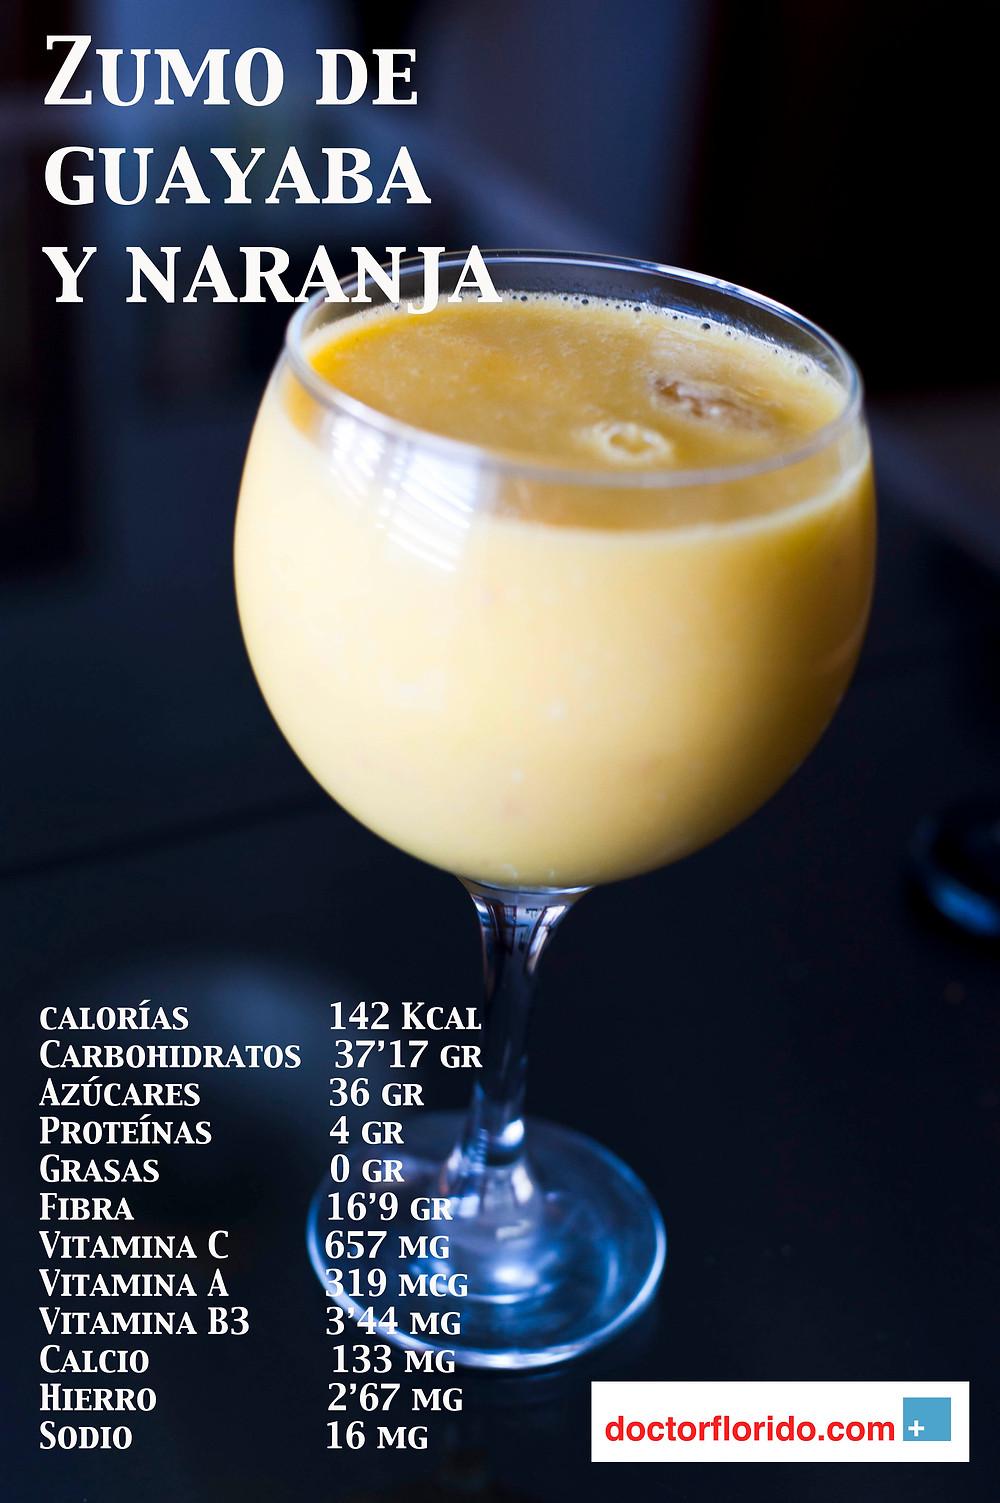 zumo de guayaba y naranja